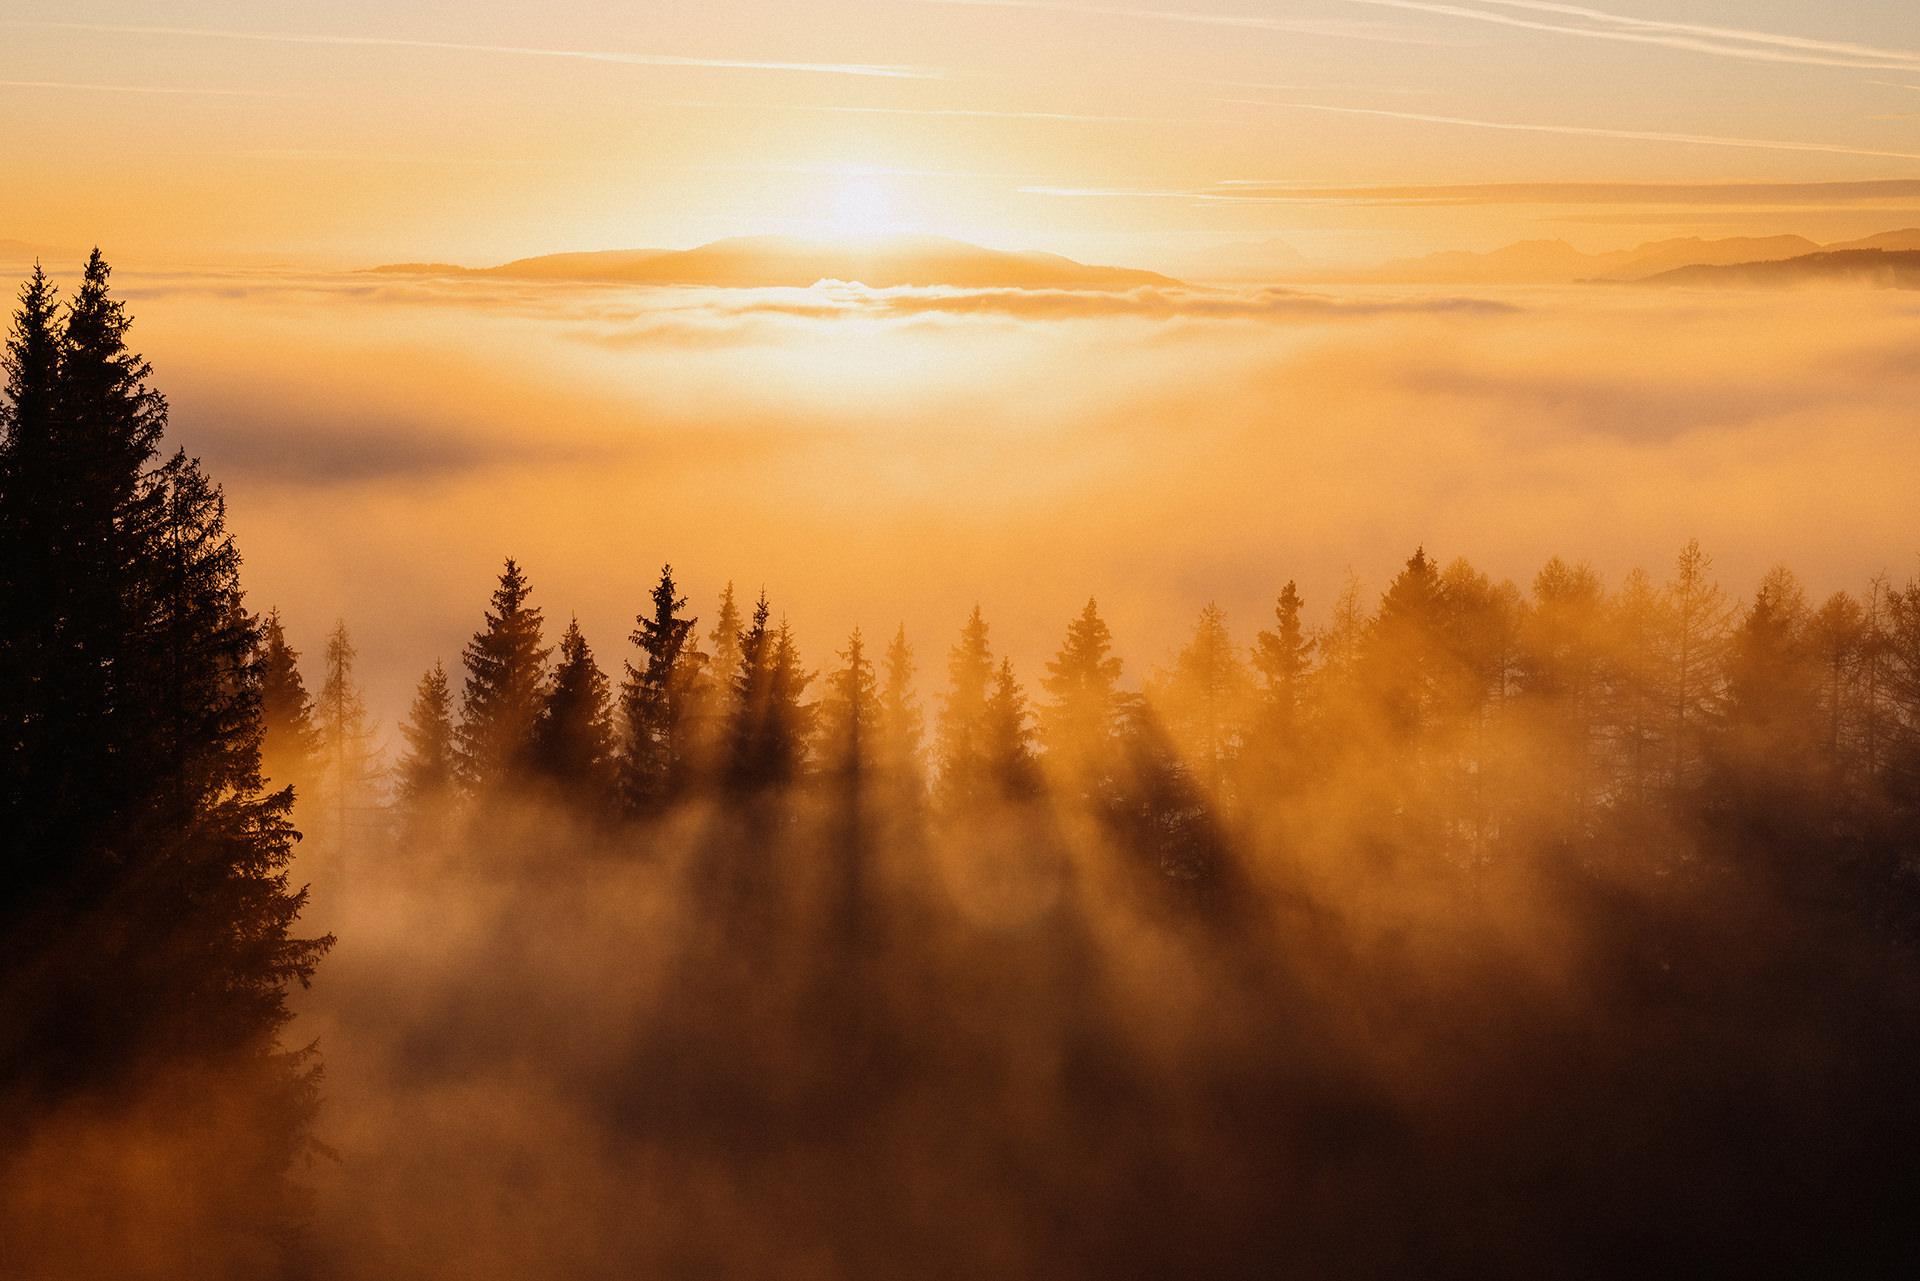 baeume-berge-nebel-sonnenuntergang